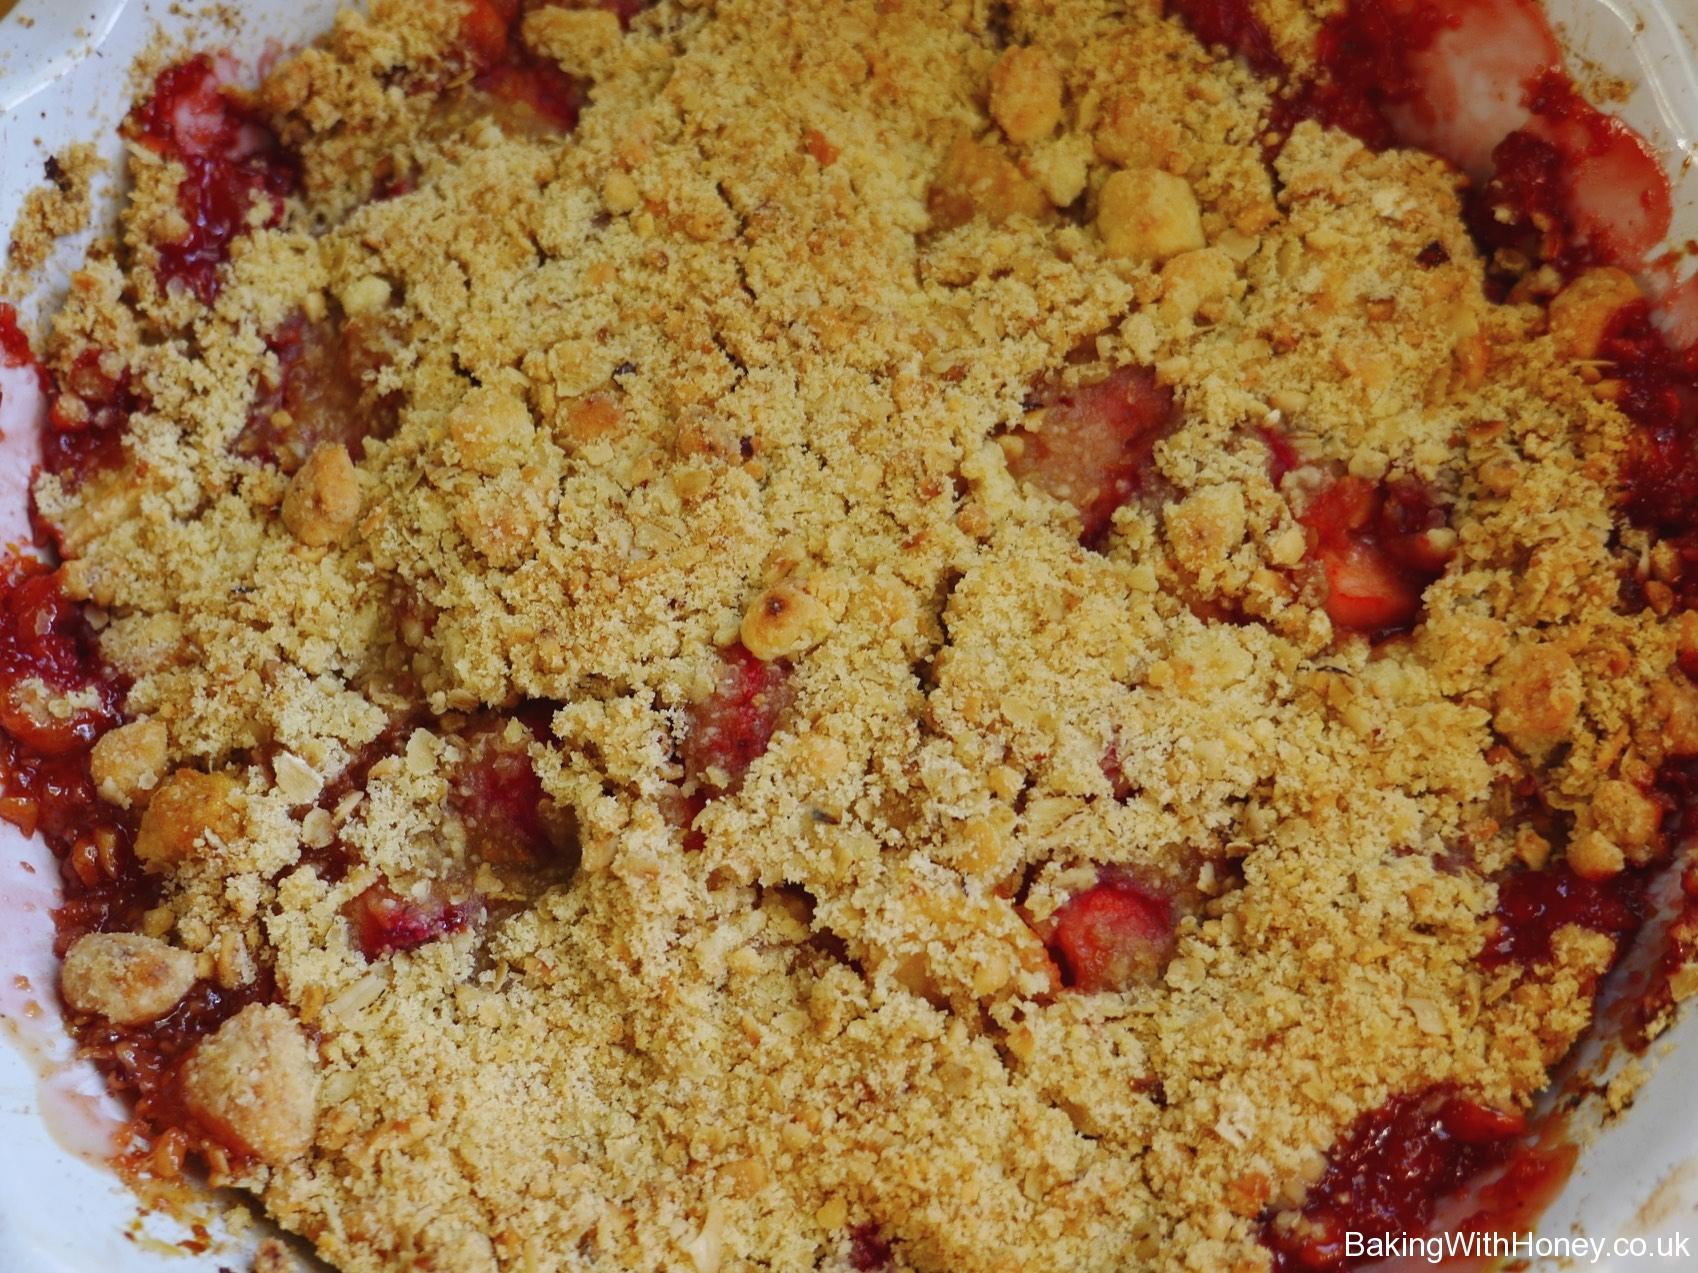 Strawberry & Caerphilly Cheese Summer Crumble